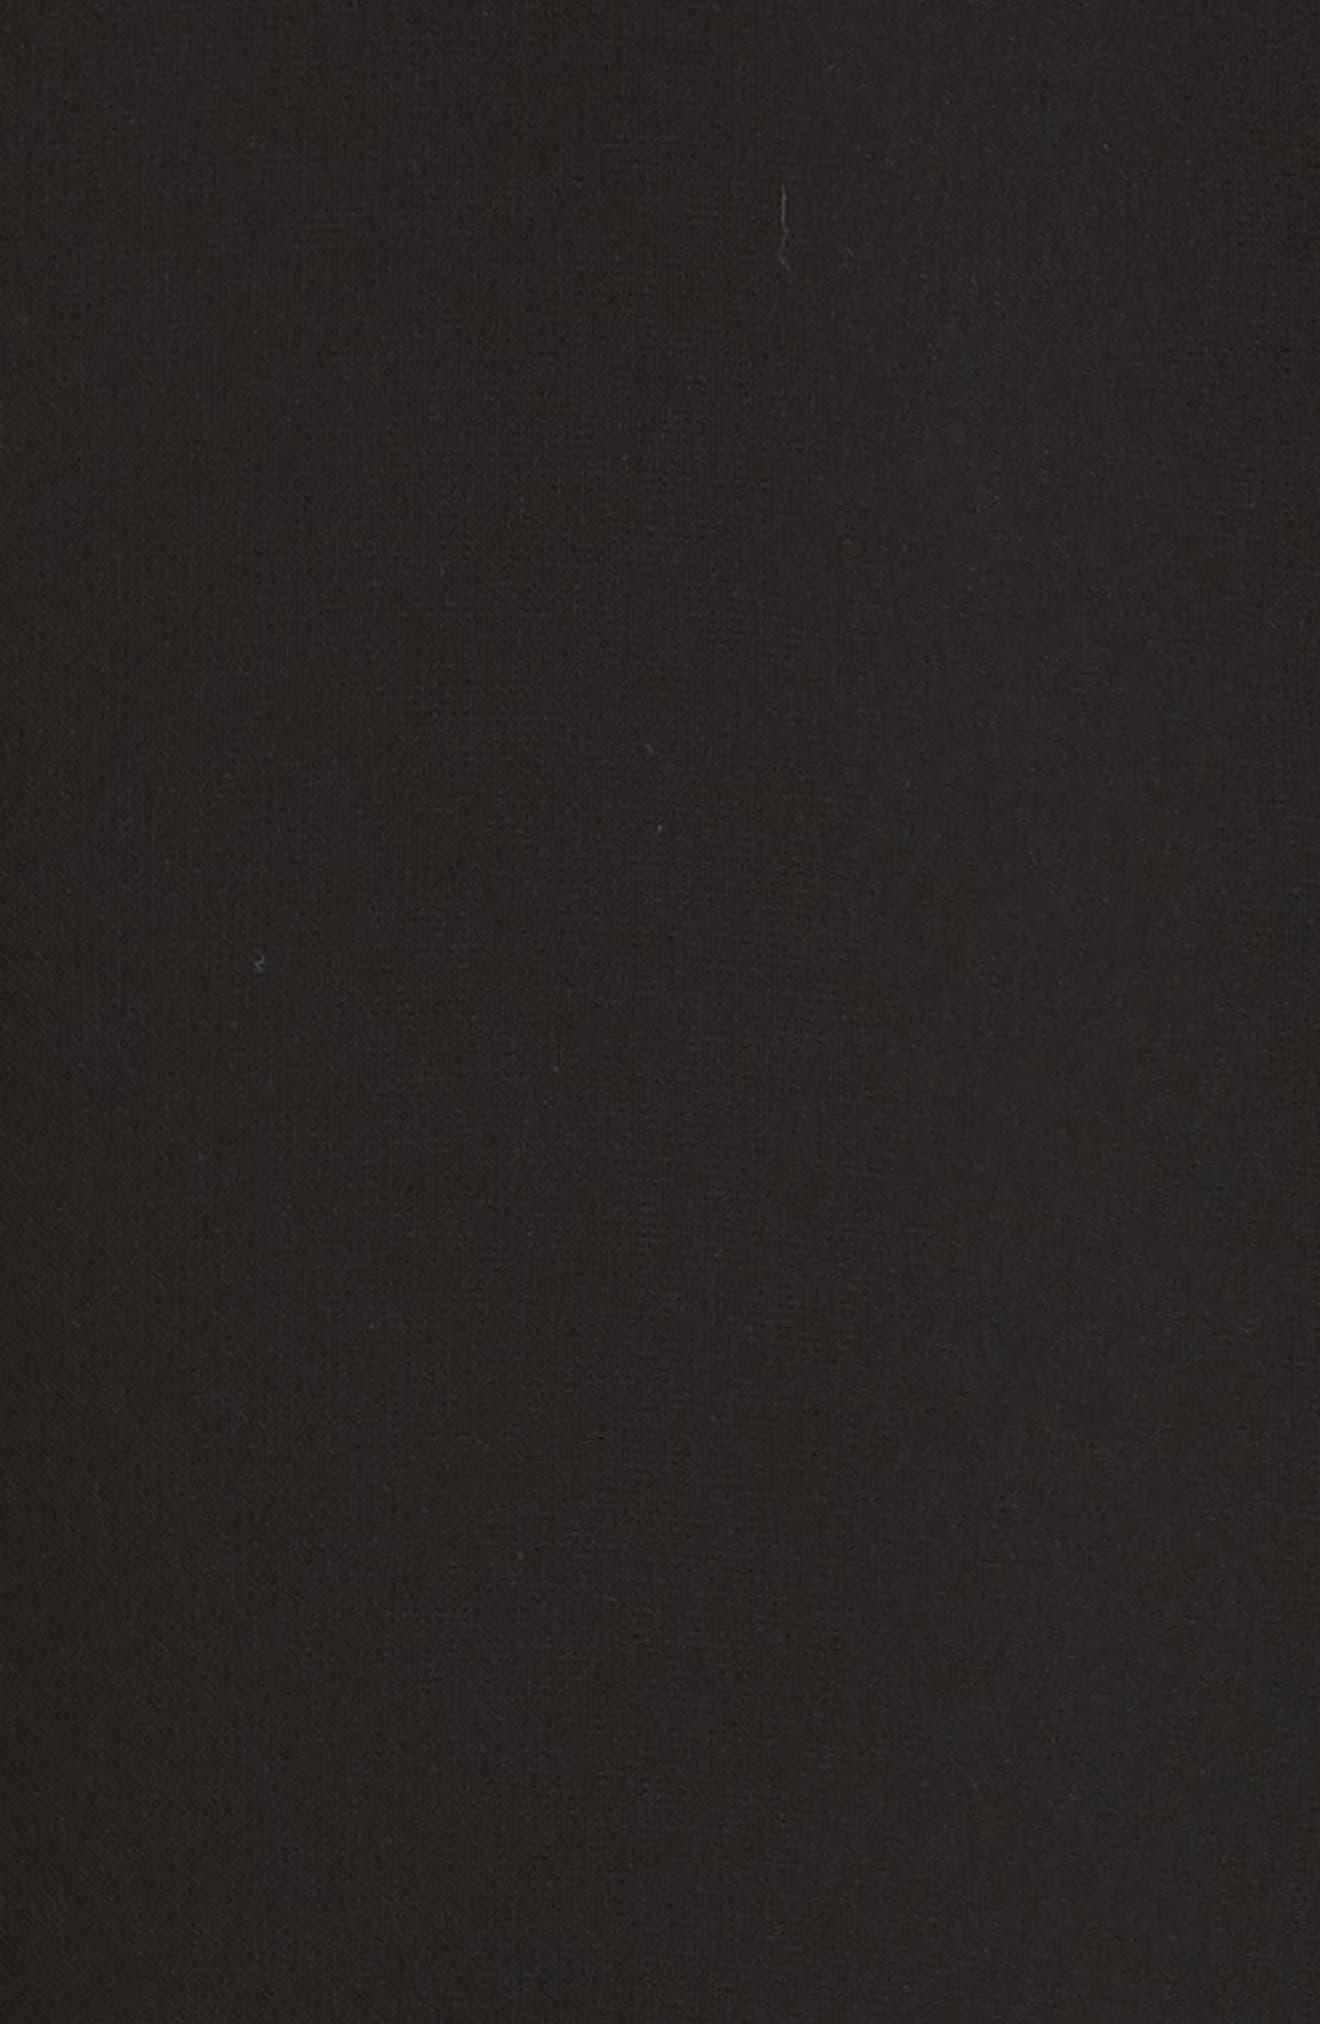 EMPORIO ARMANI,                             Draped Cady Shift Dress,                             Alternate thumbnail 5, color,                             004